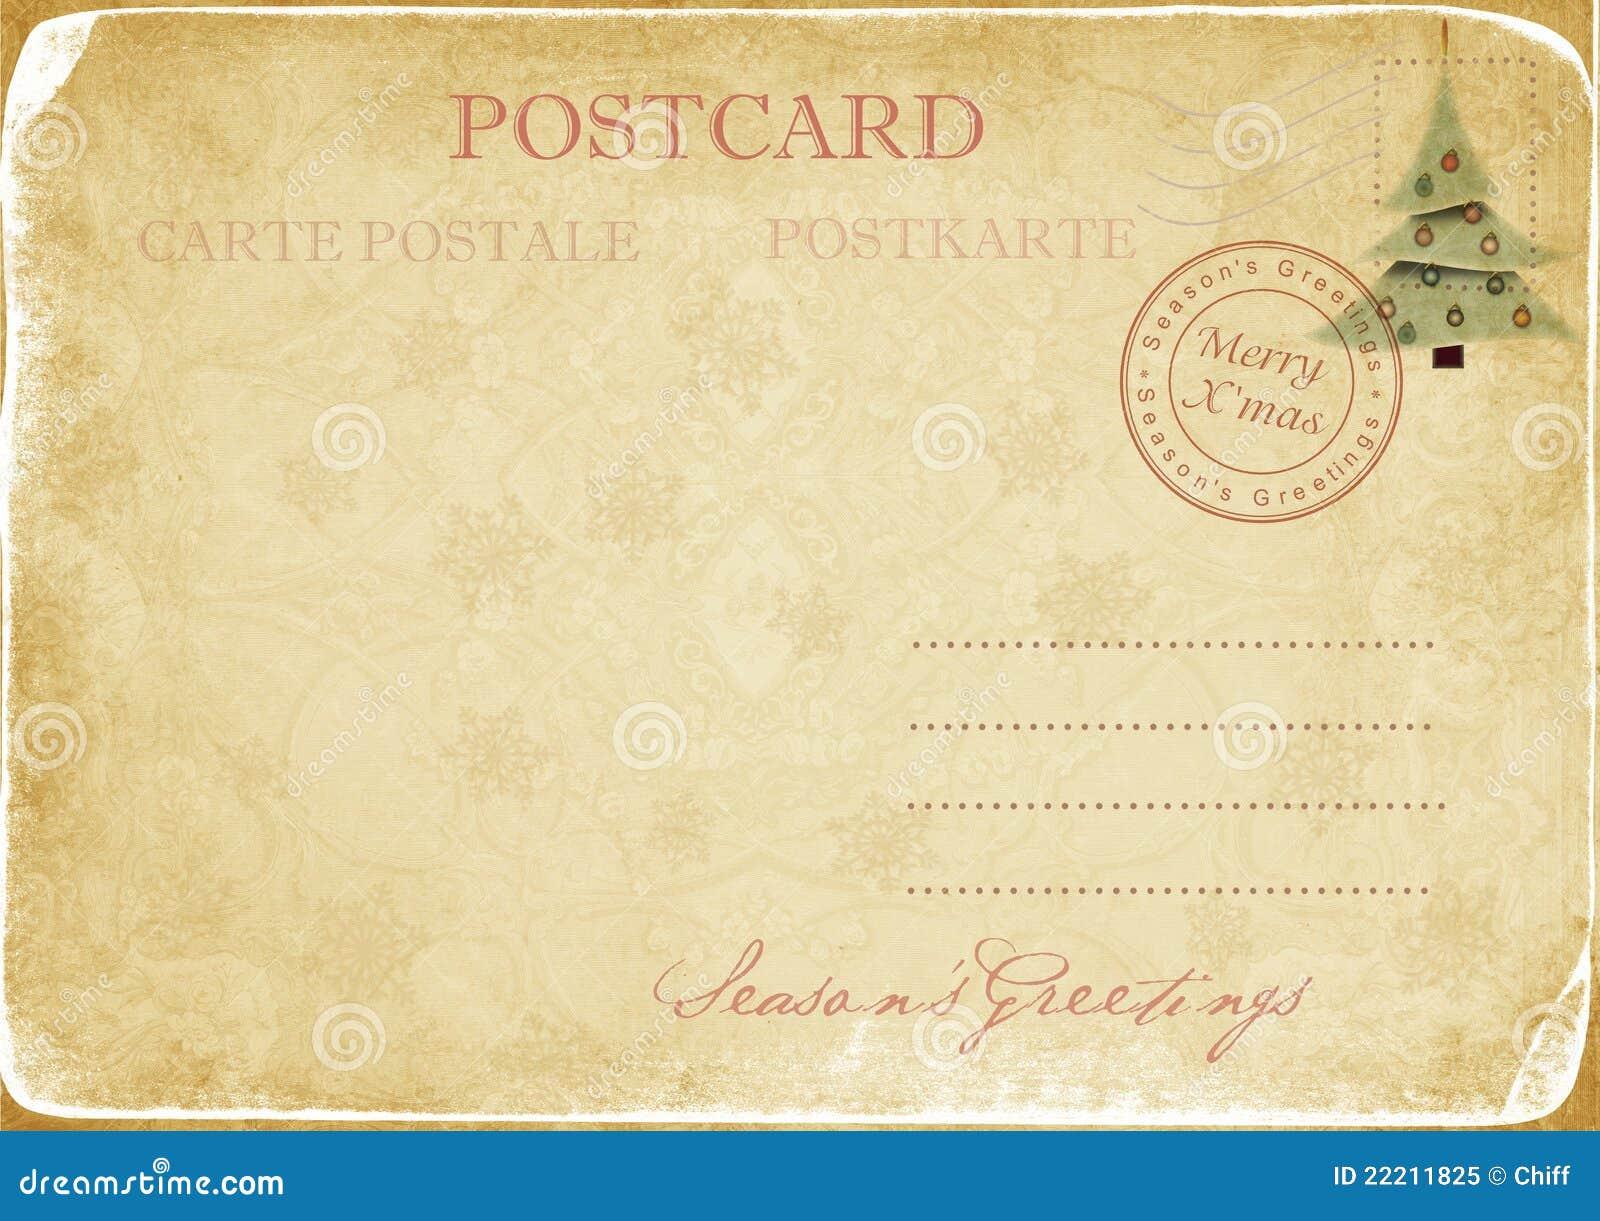 Vintage Christmas Postcard Royalty Free Stock Photo - Image: 22211825